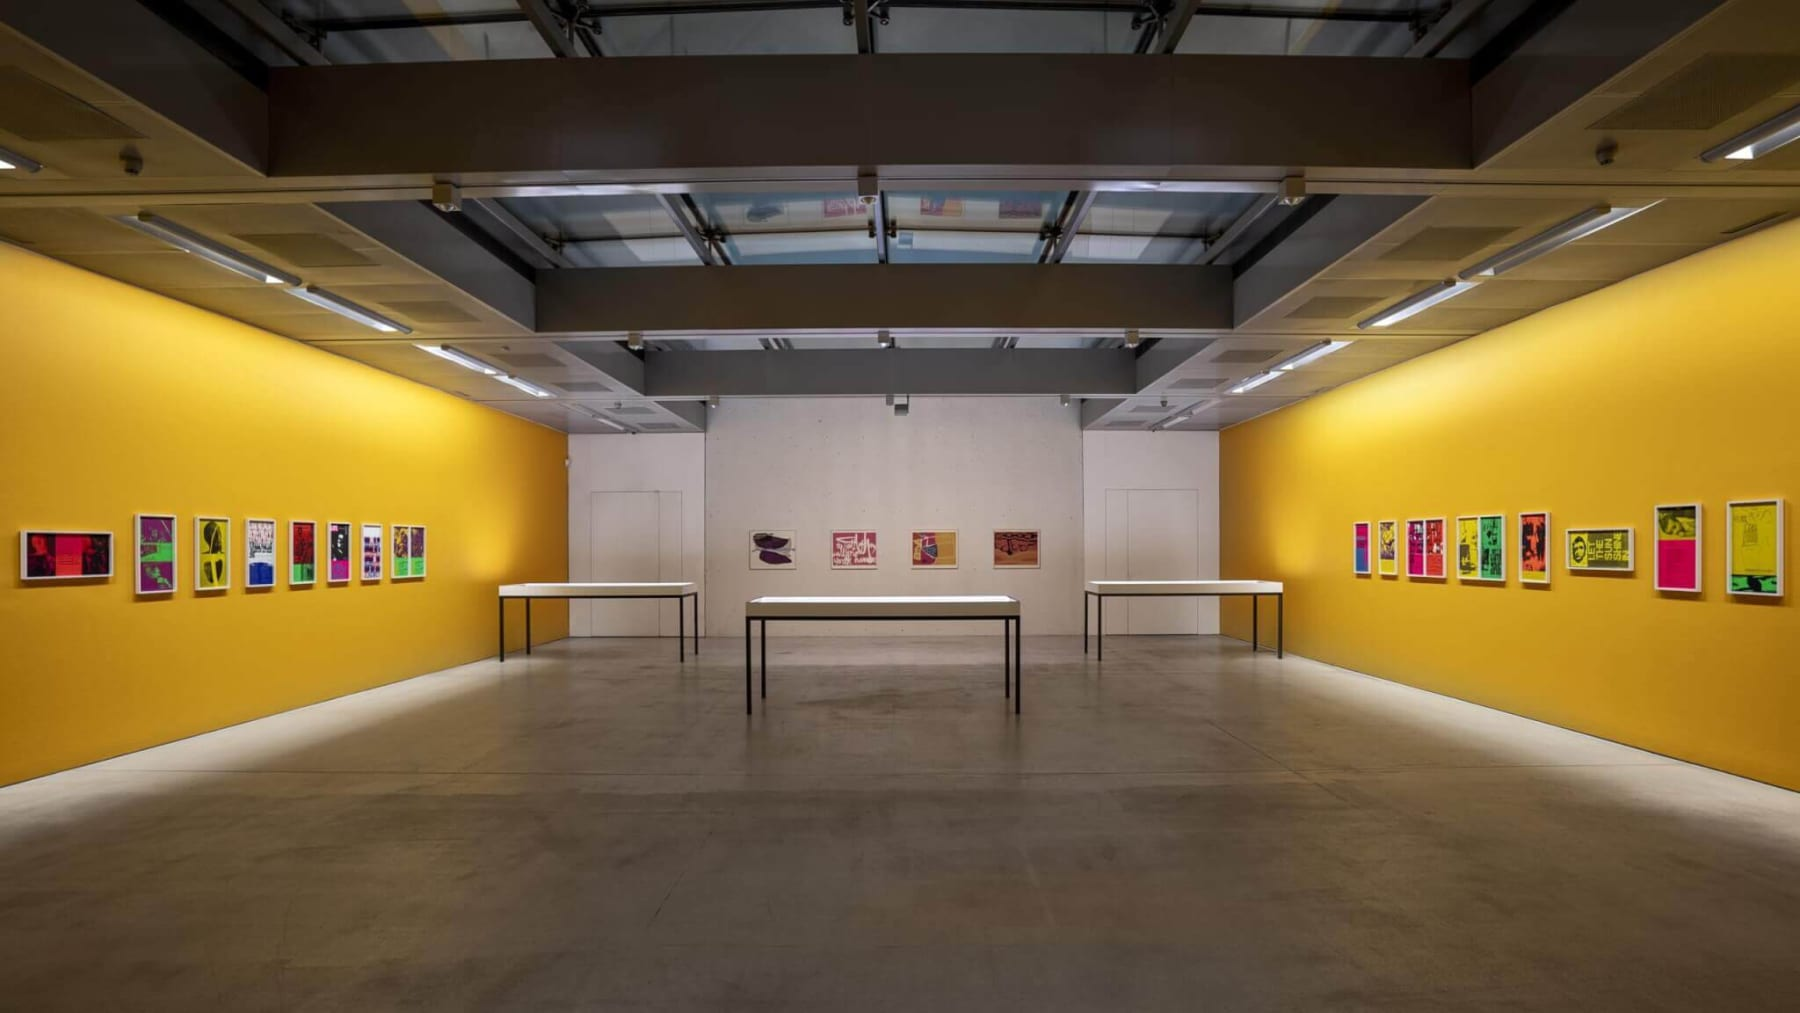 Joyful Revolutionary, Taxispalais Kunsthalle, Tirol, Innsbruck (2020)